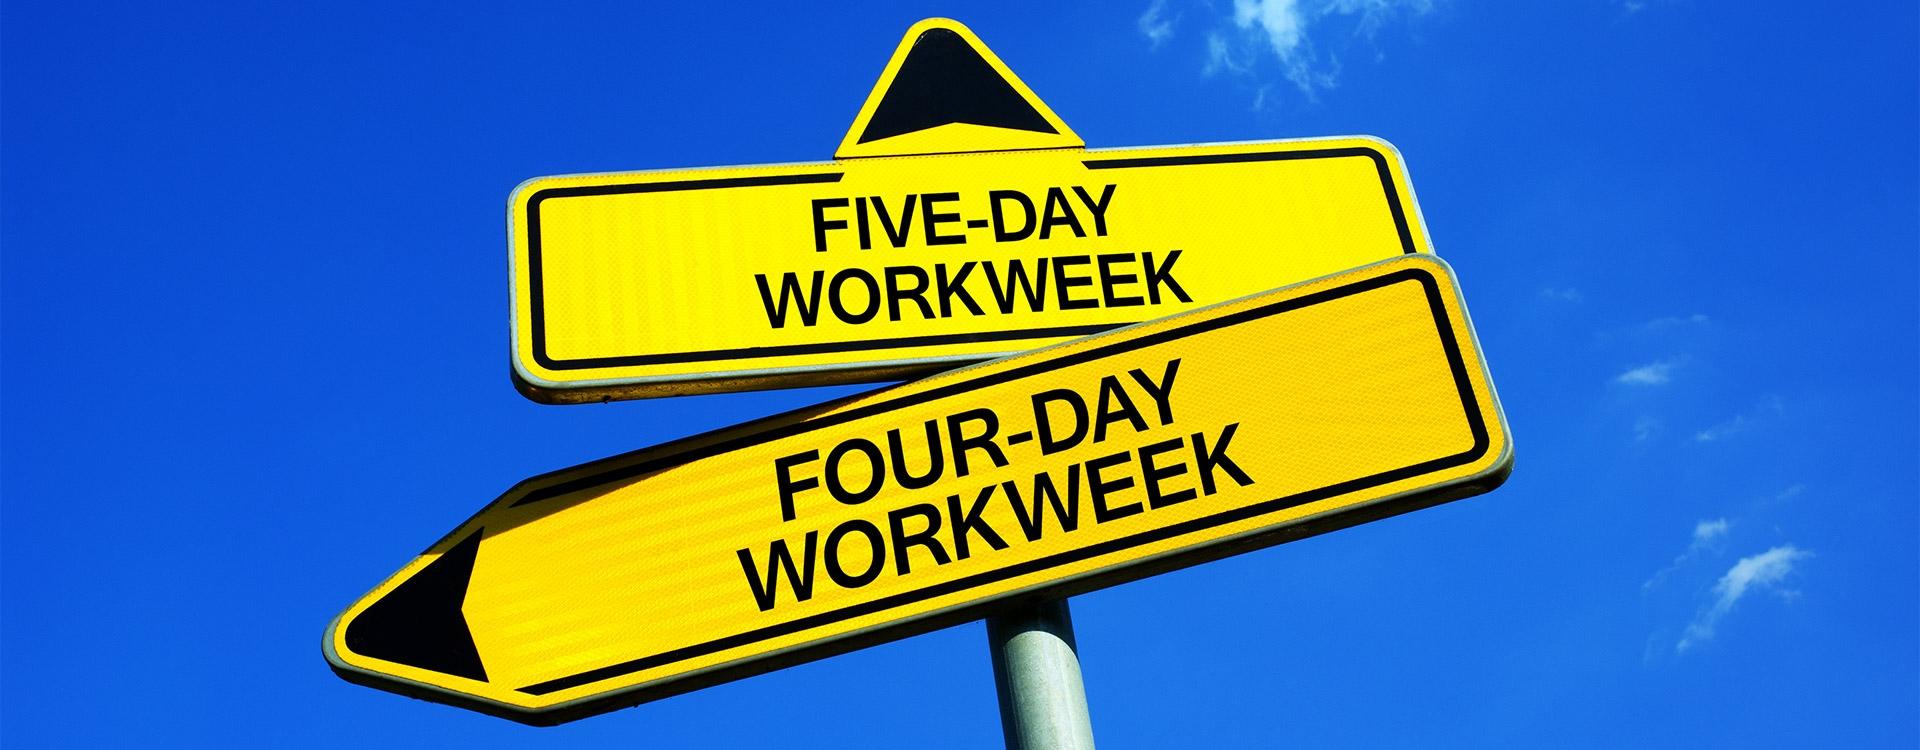 Shorter work weeks (B2-C1)